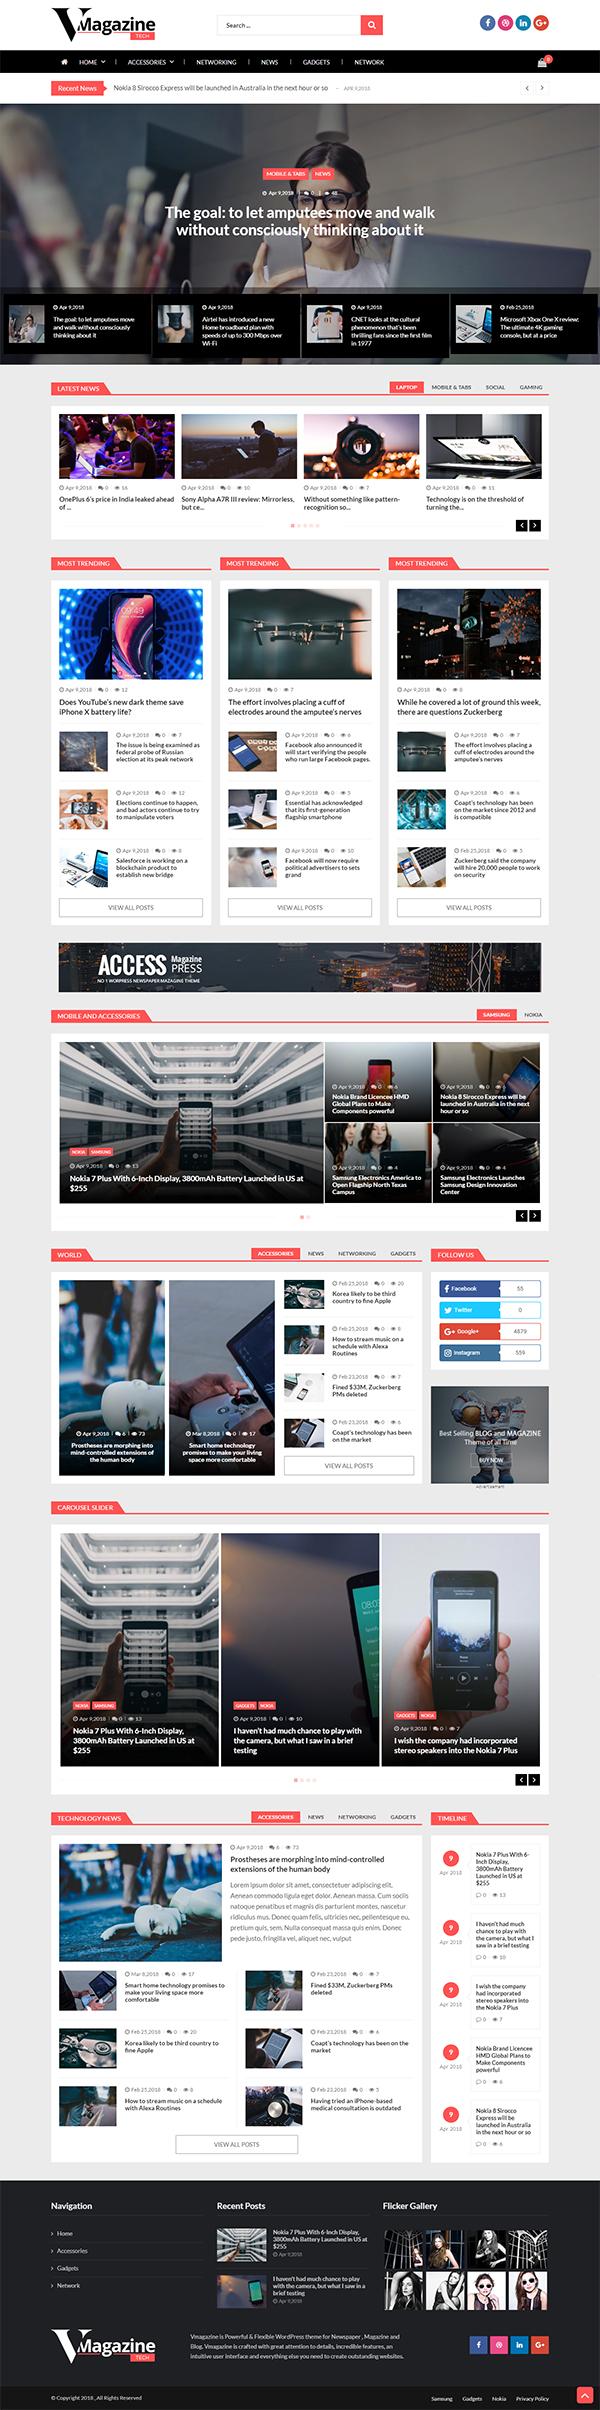 Vmagazine- Blog and Magazine WordPress Themes